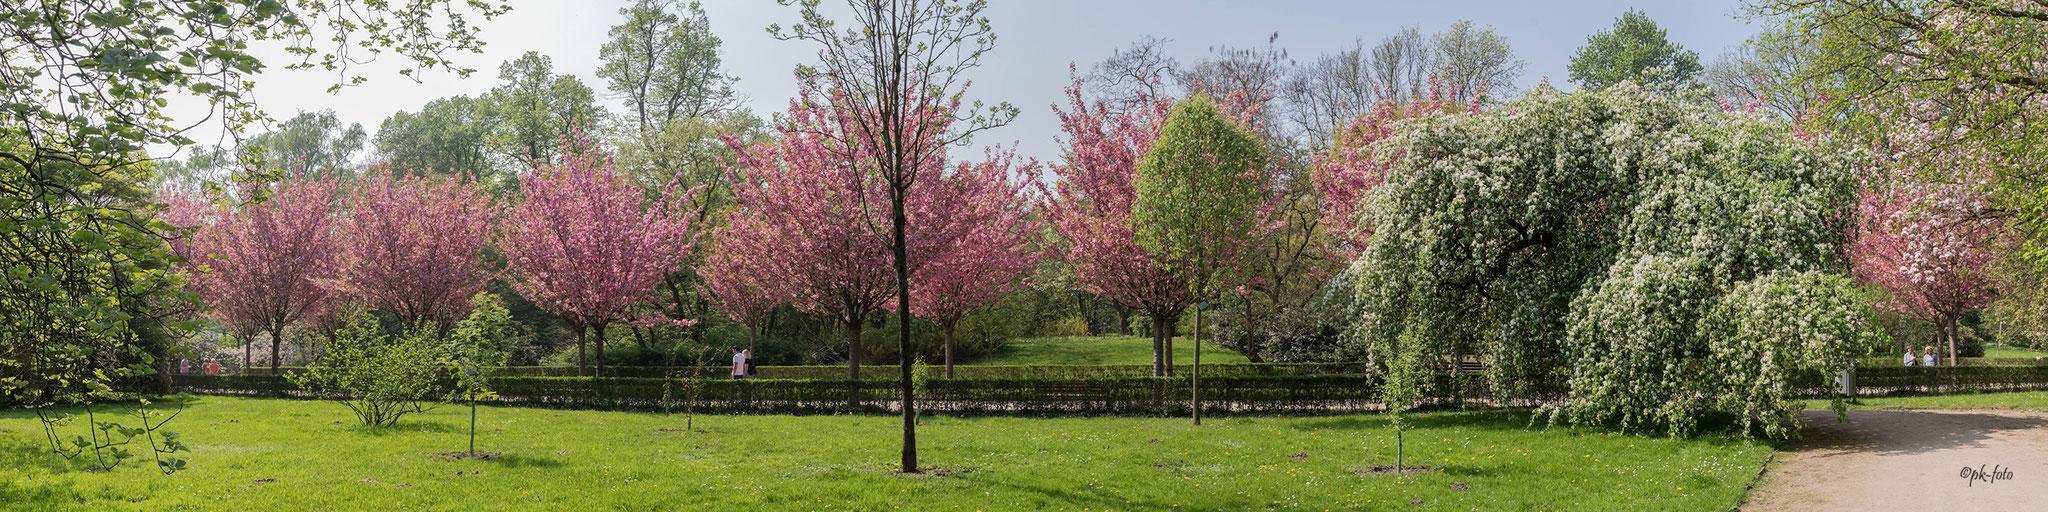 Panoramaaufnahme im Dortmunder Rombergpark